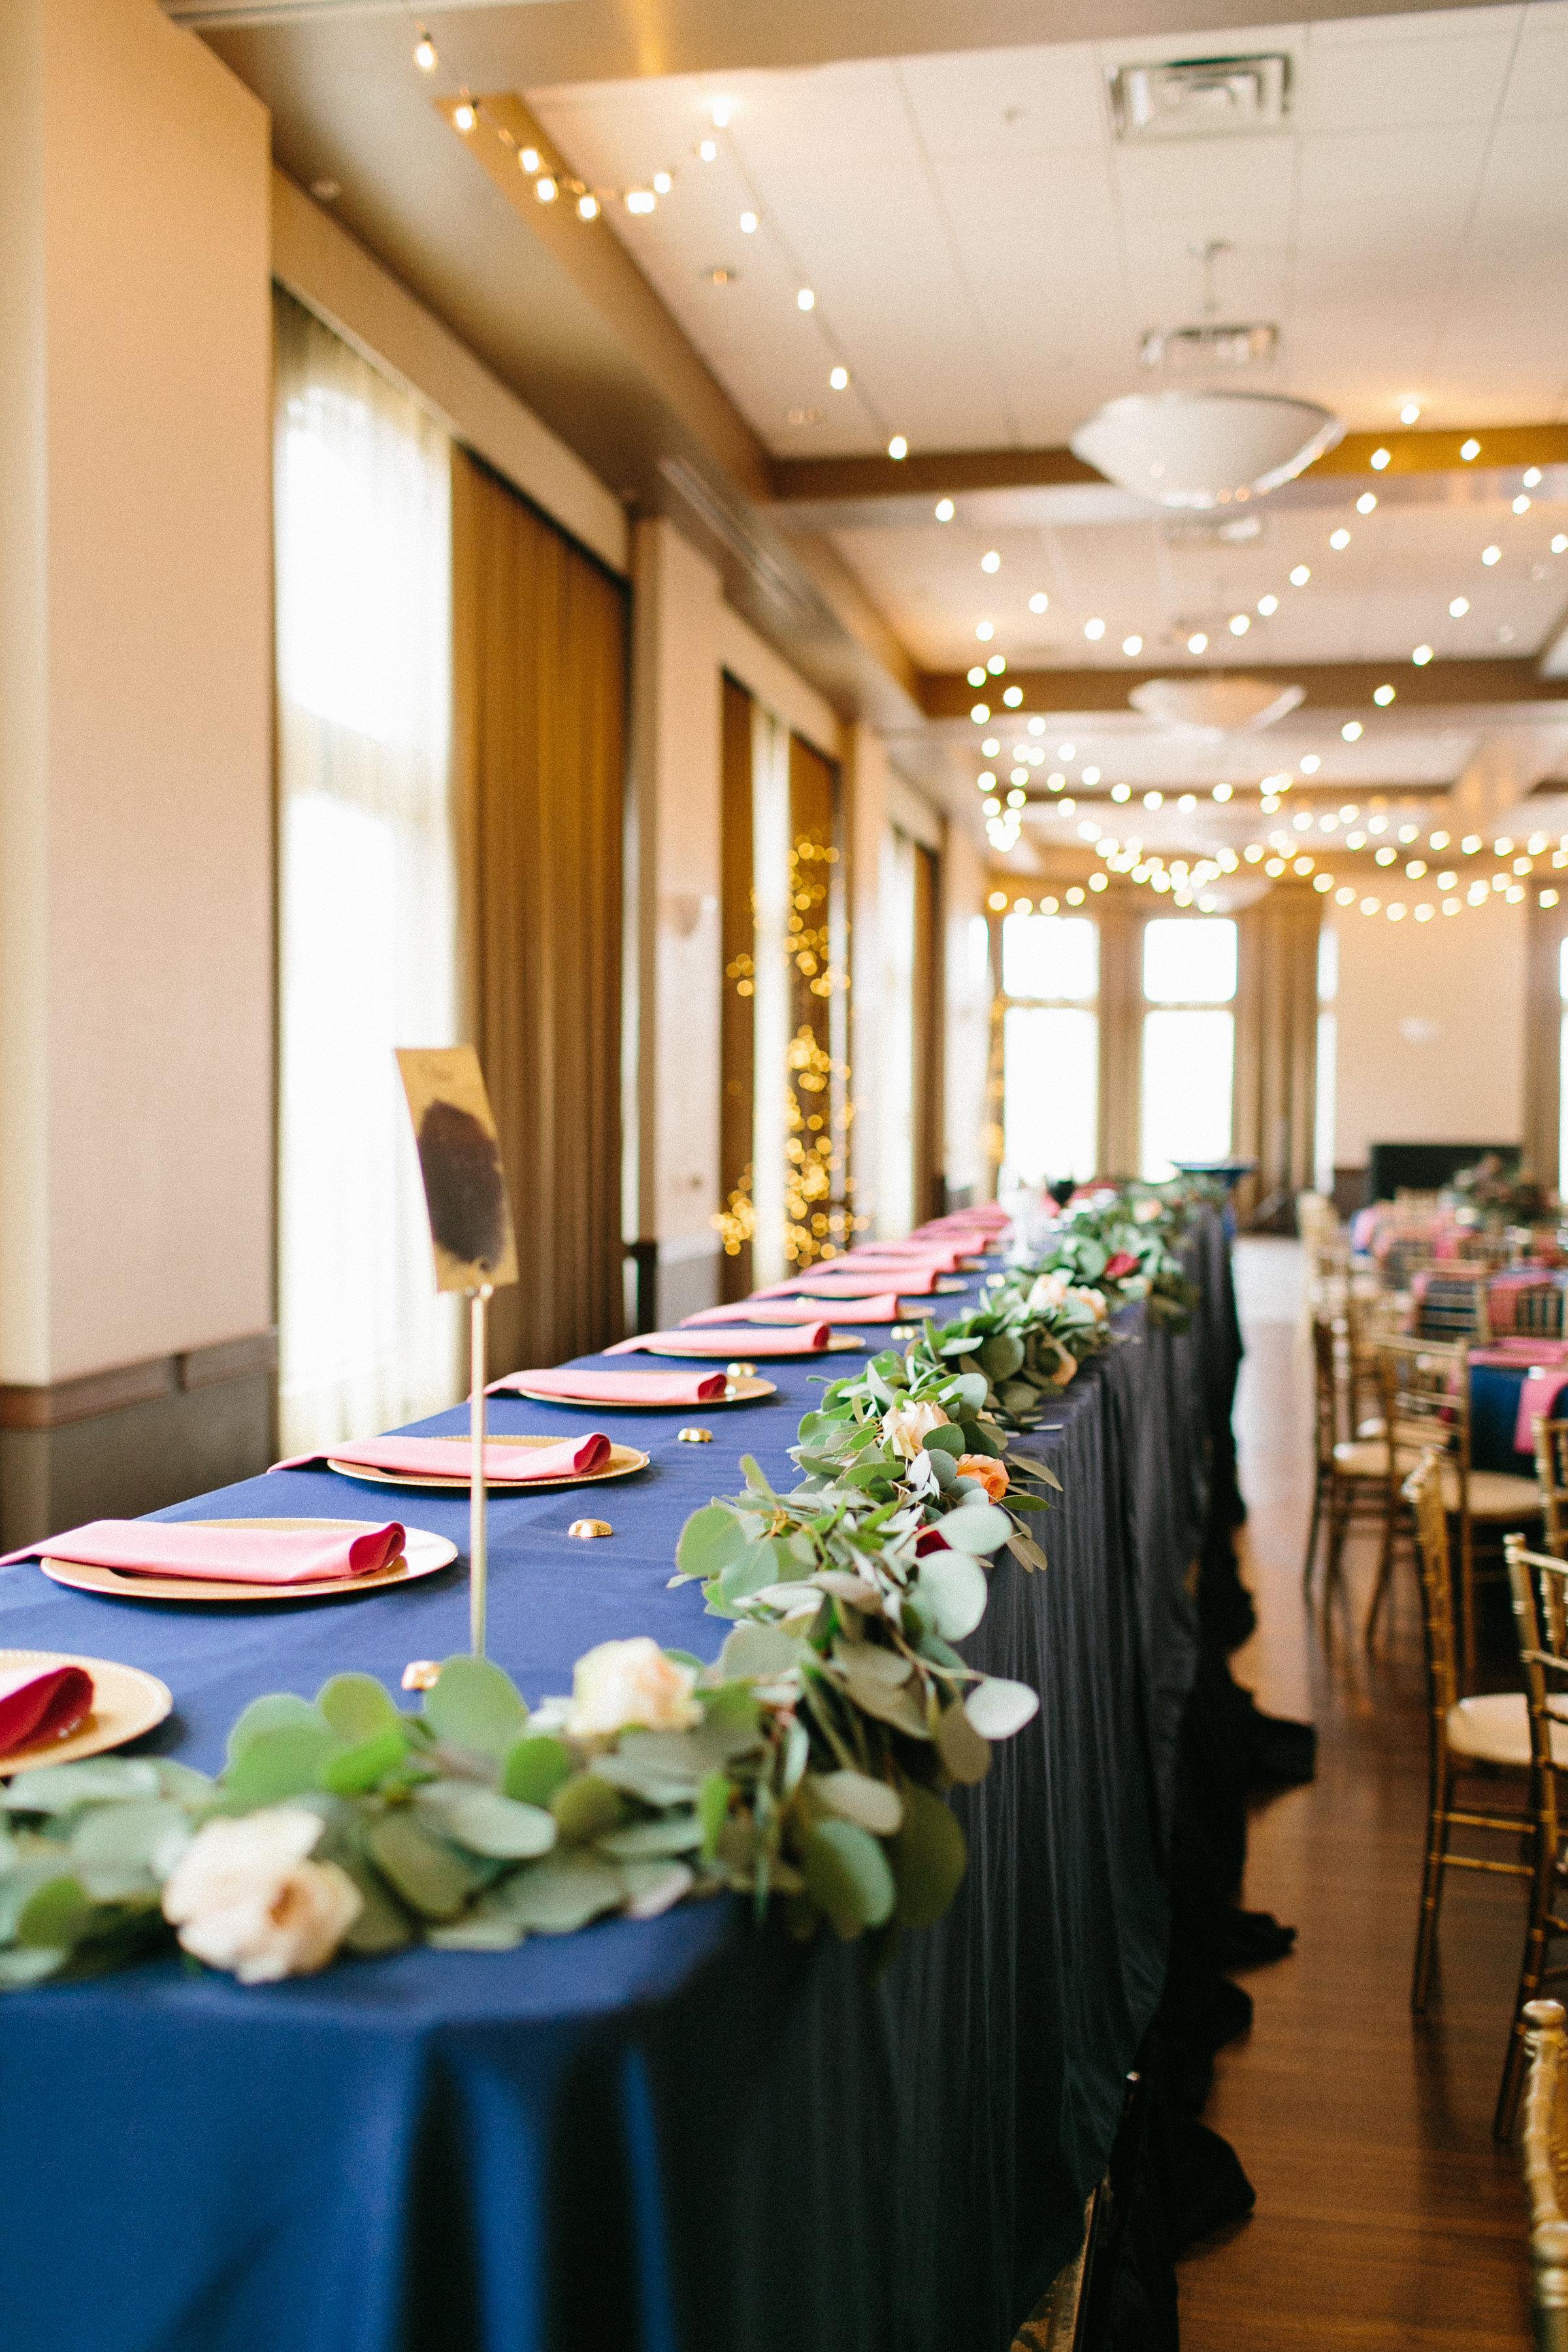 2017_Carly_Milbrath_Jefferson_Street_Inn_Wedding_Wausau_WI_018.JPG